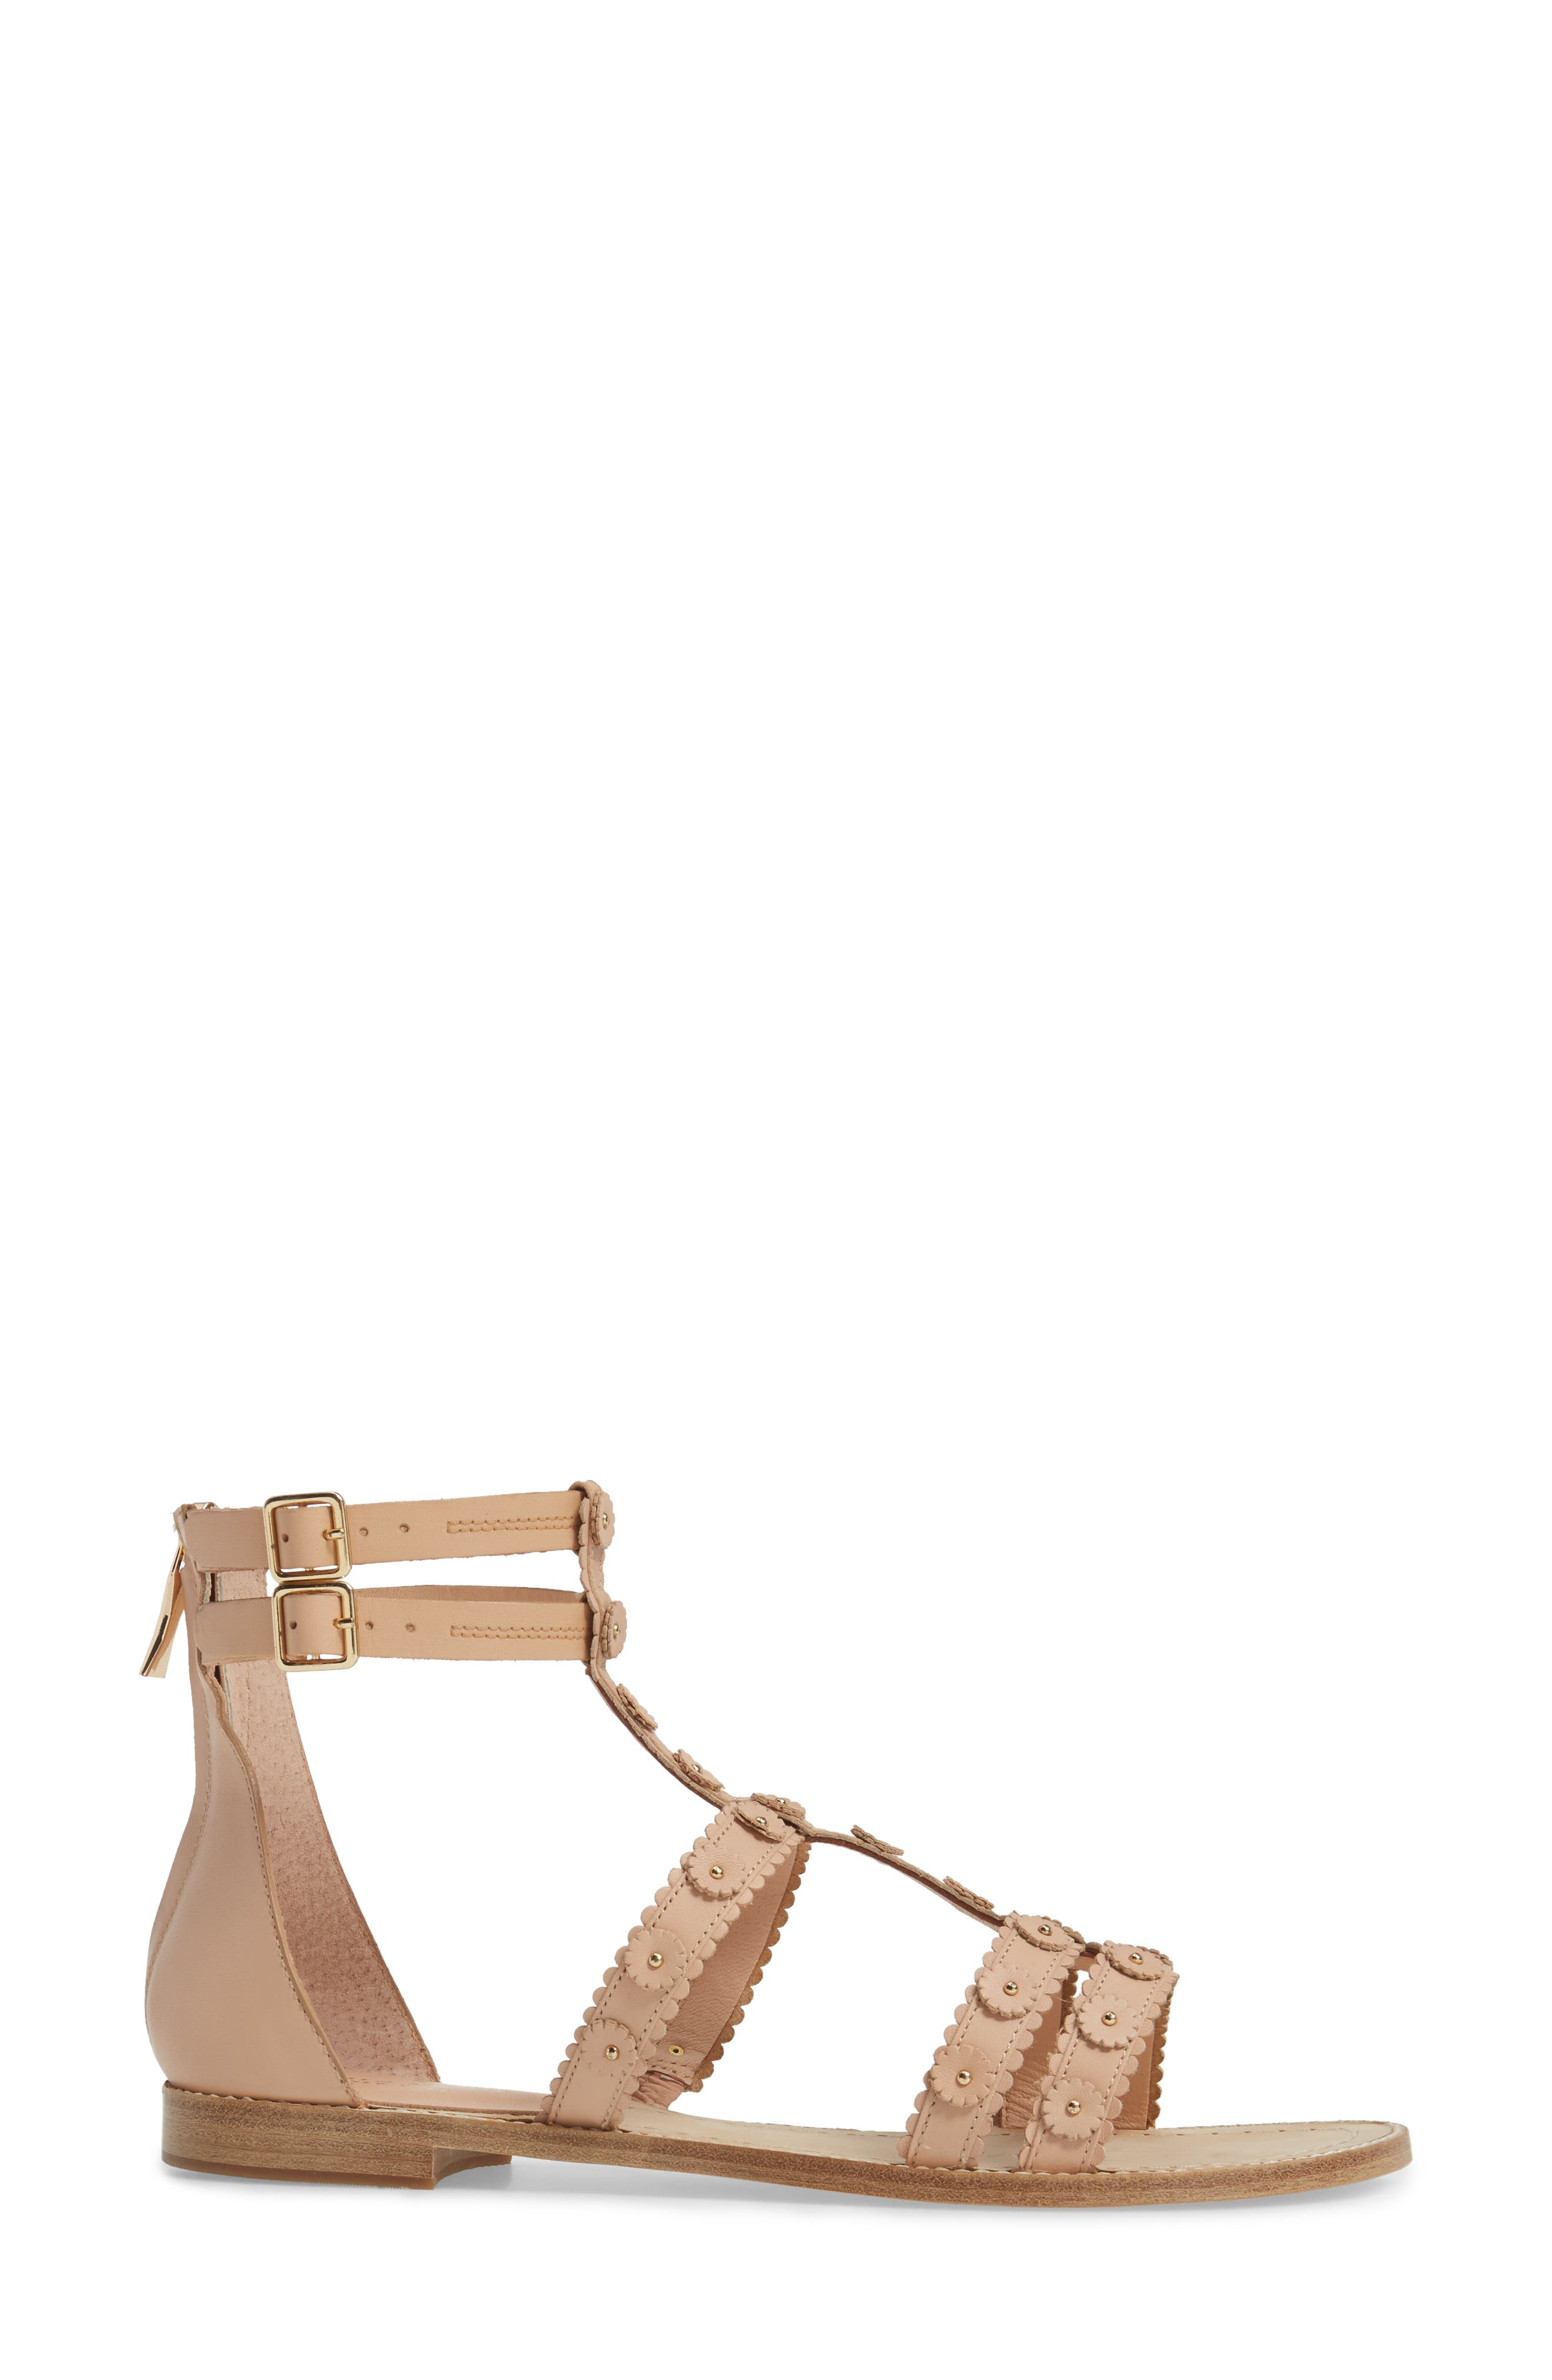 Alternate Image 3  - kate spade new york santina sandal (Women)